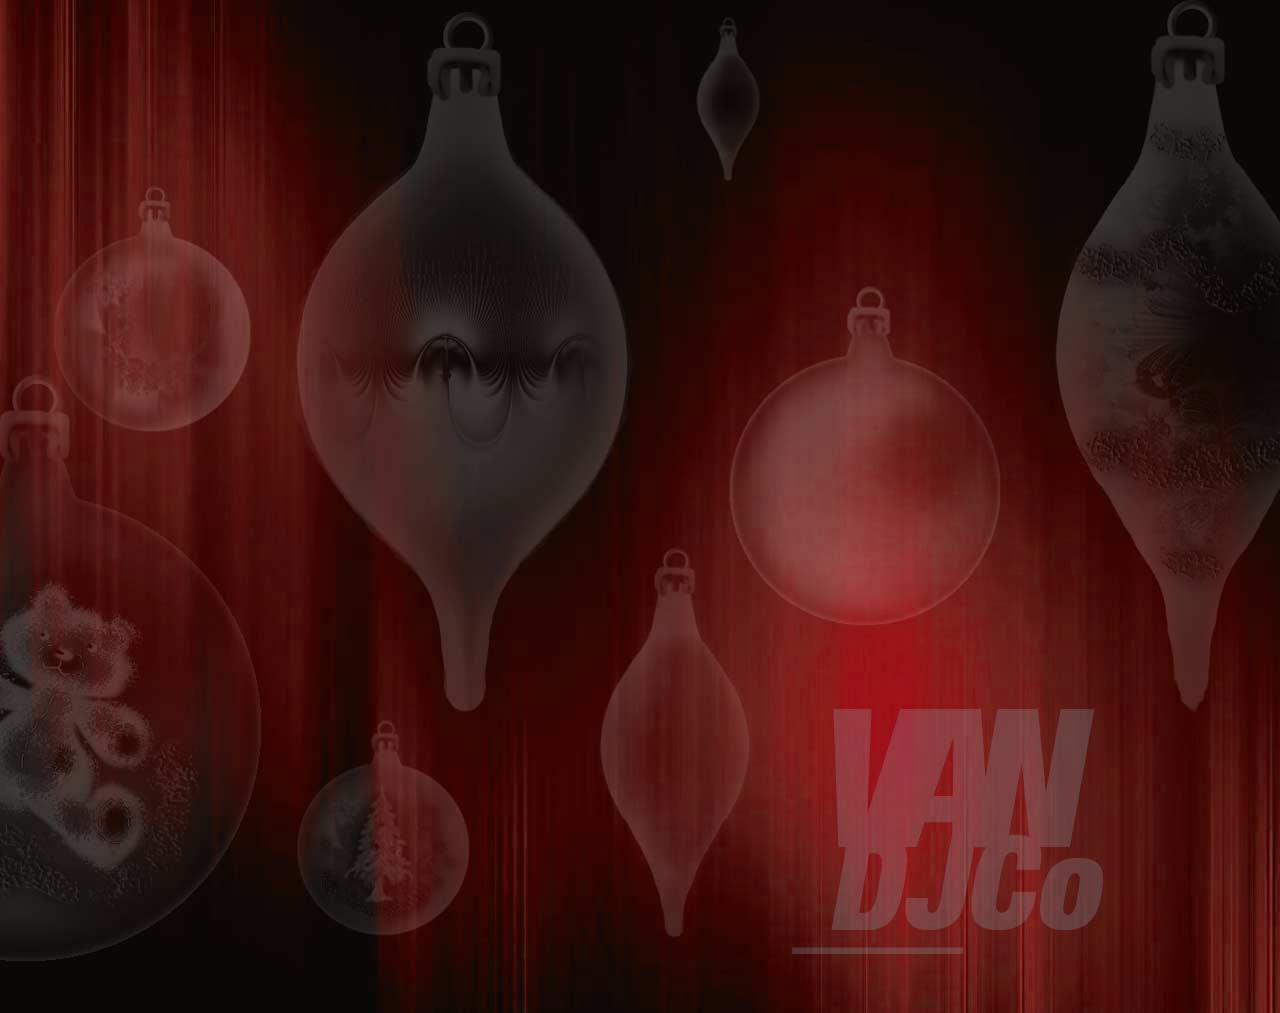 Xmas, Christmas, Hanukkah and seasonal DJ party service in Vancouver.